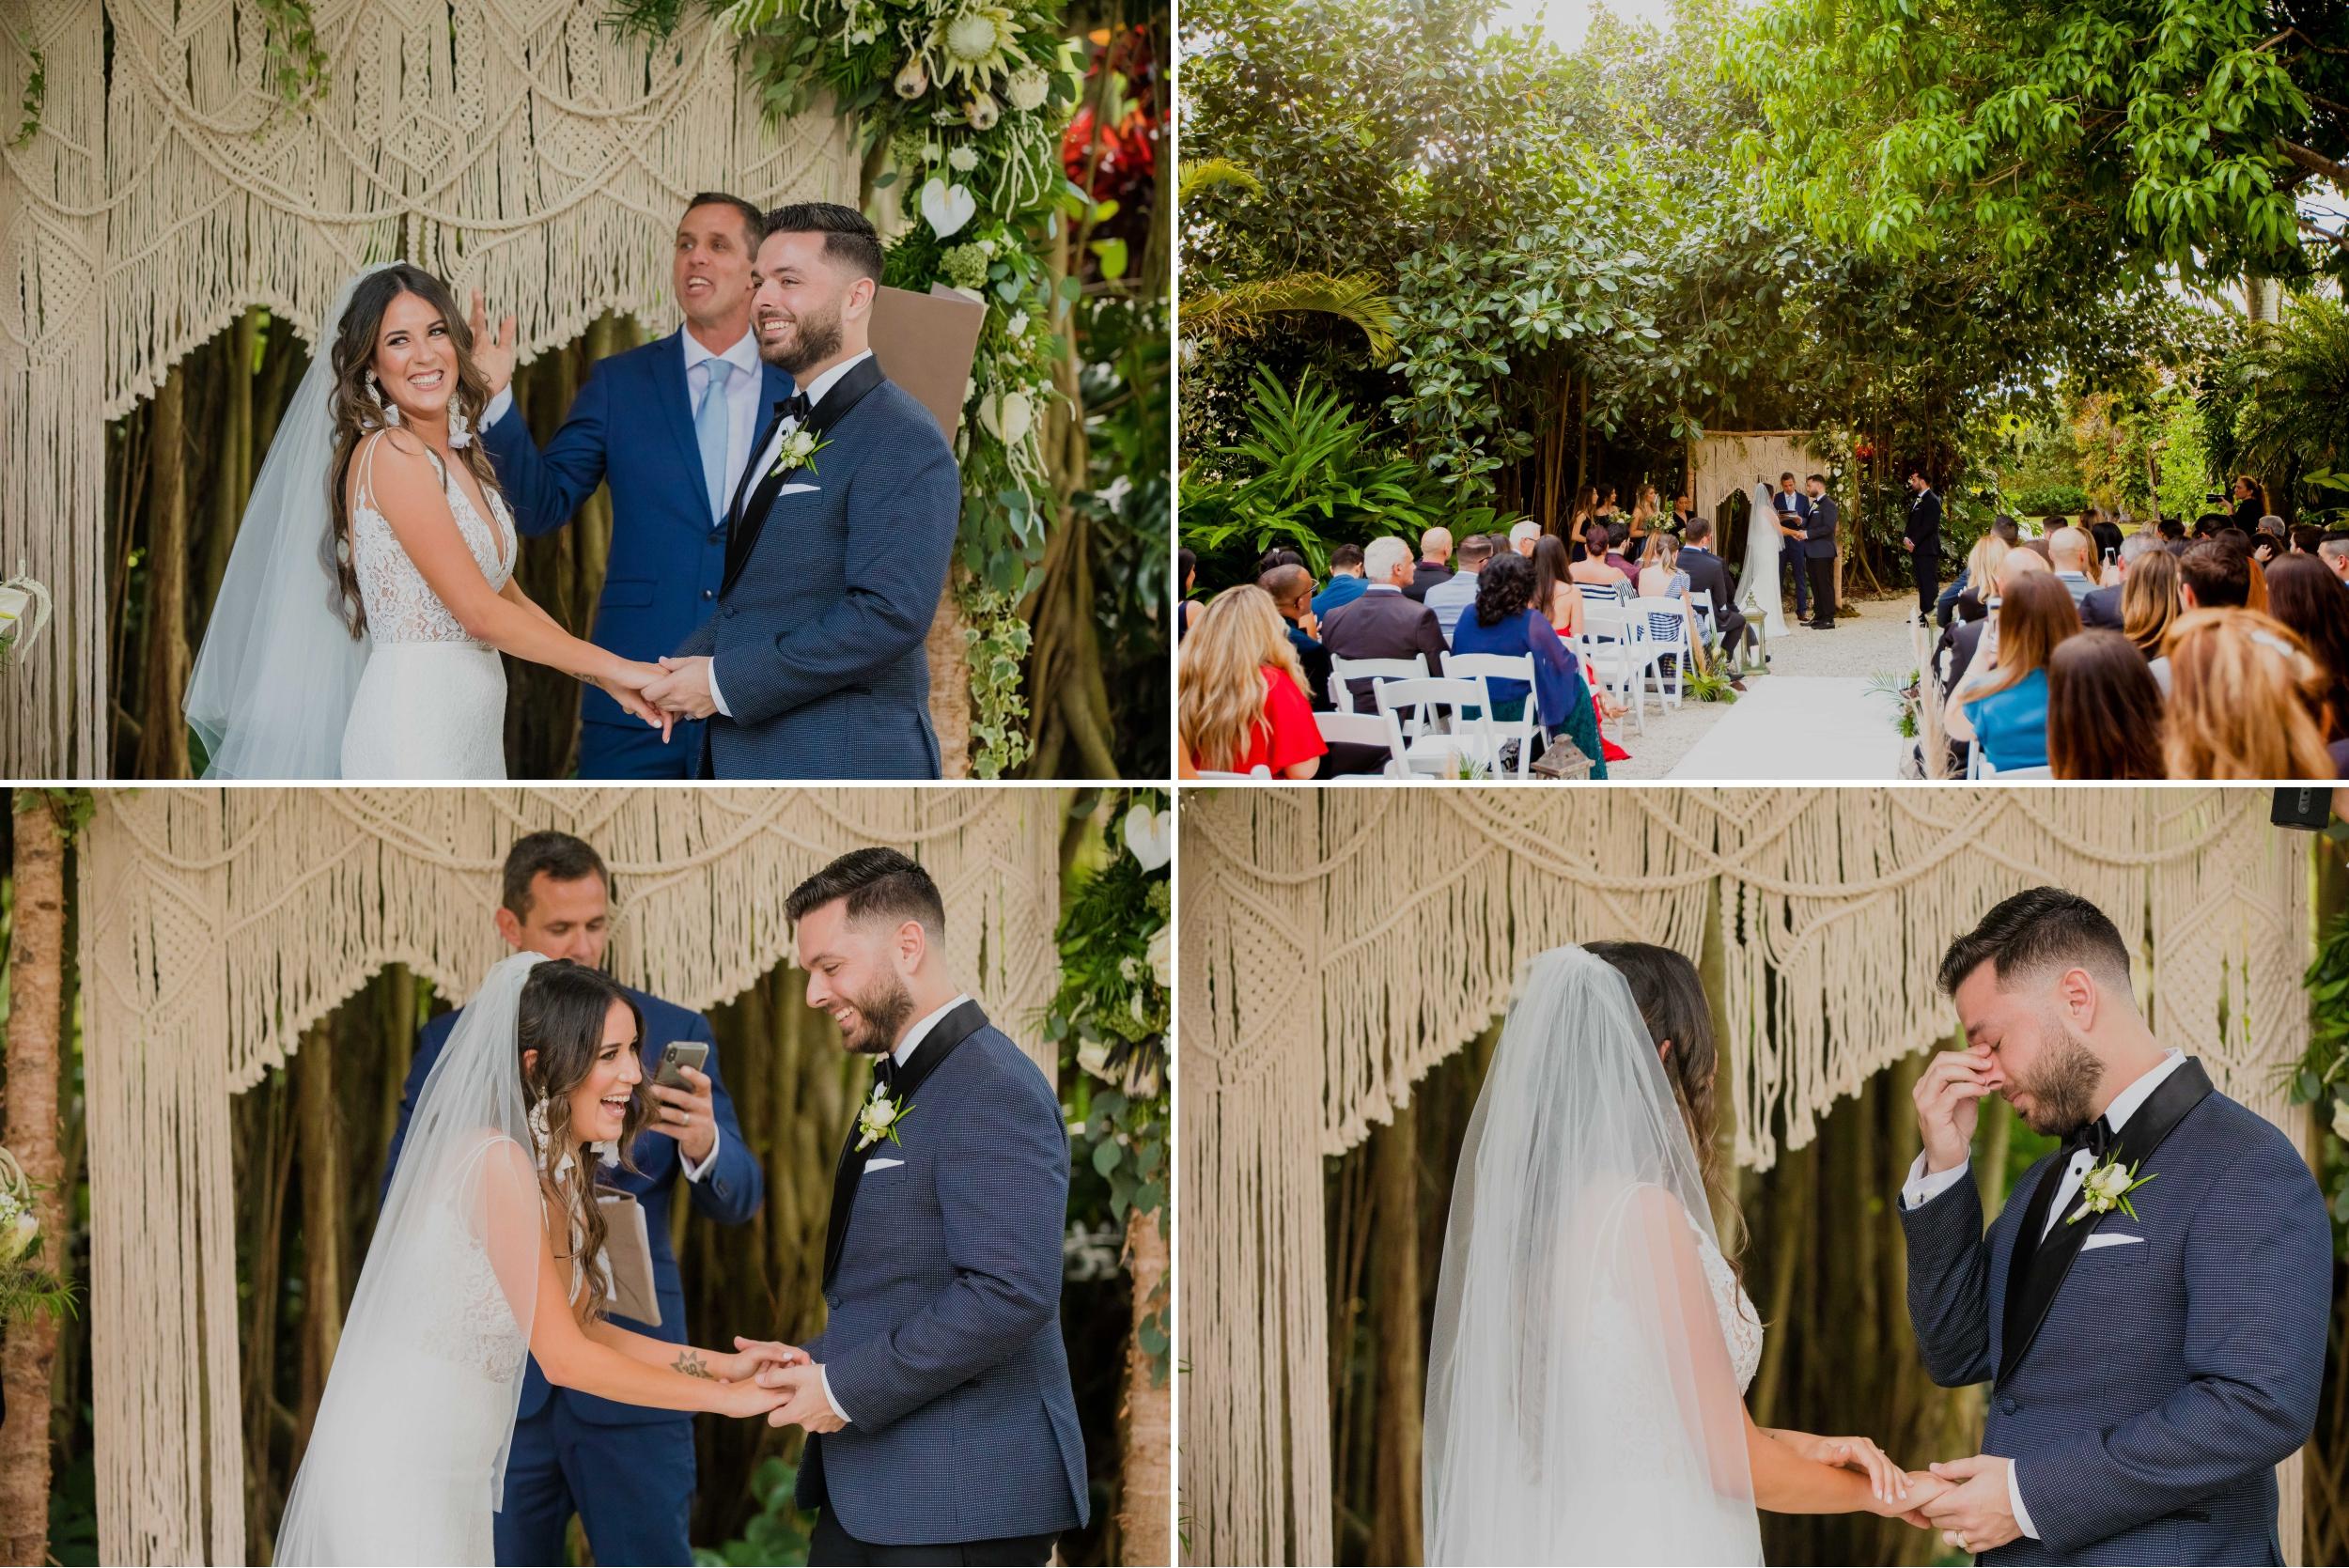 Wedding Whimsical Key West House  - Photography by Santy Martinez 14.jpg